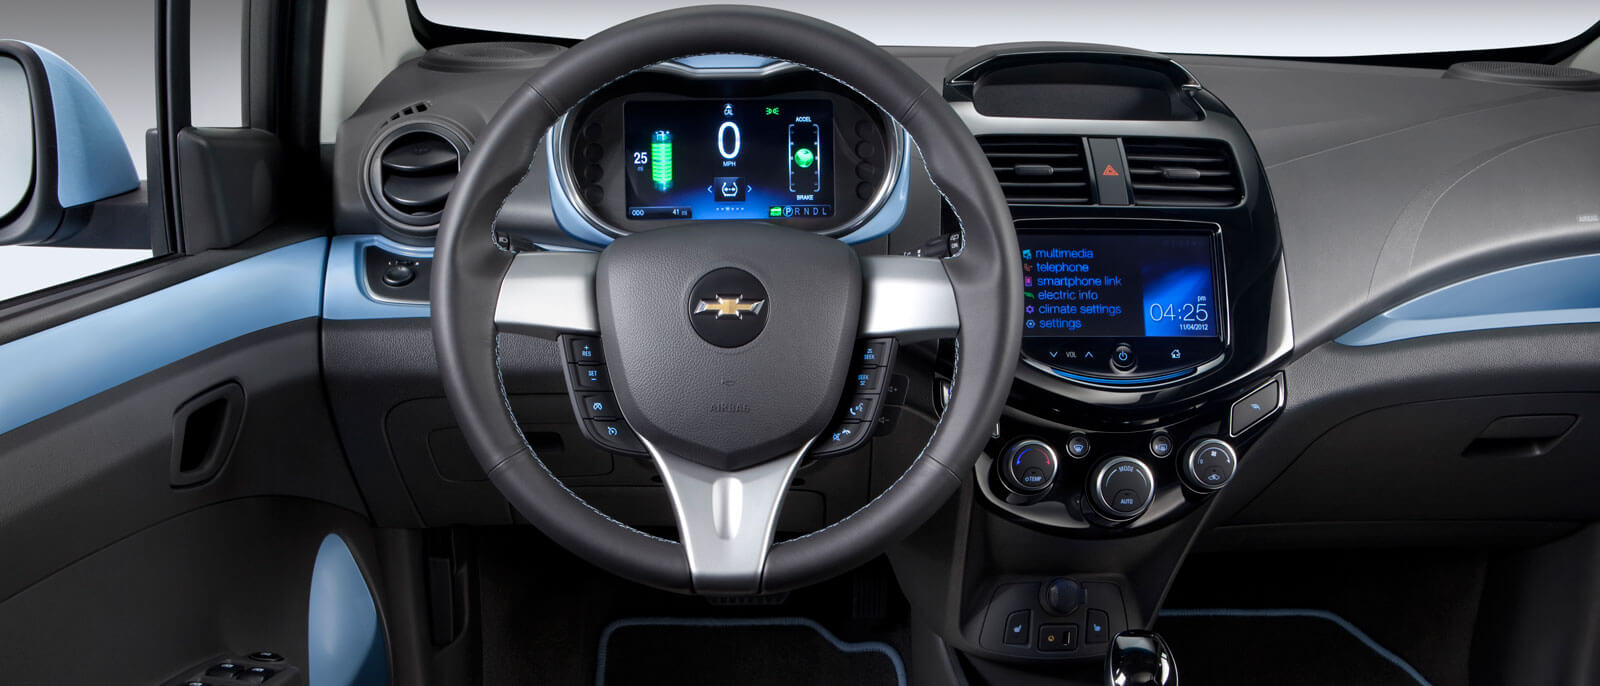 2015 Chevrolet Spark EV interior